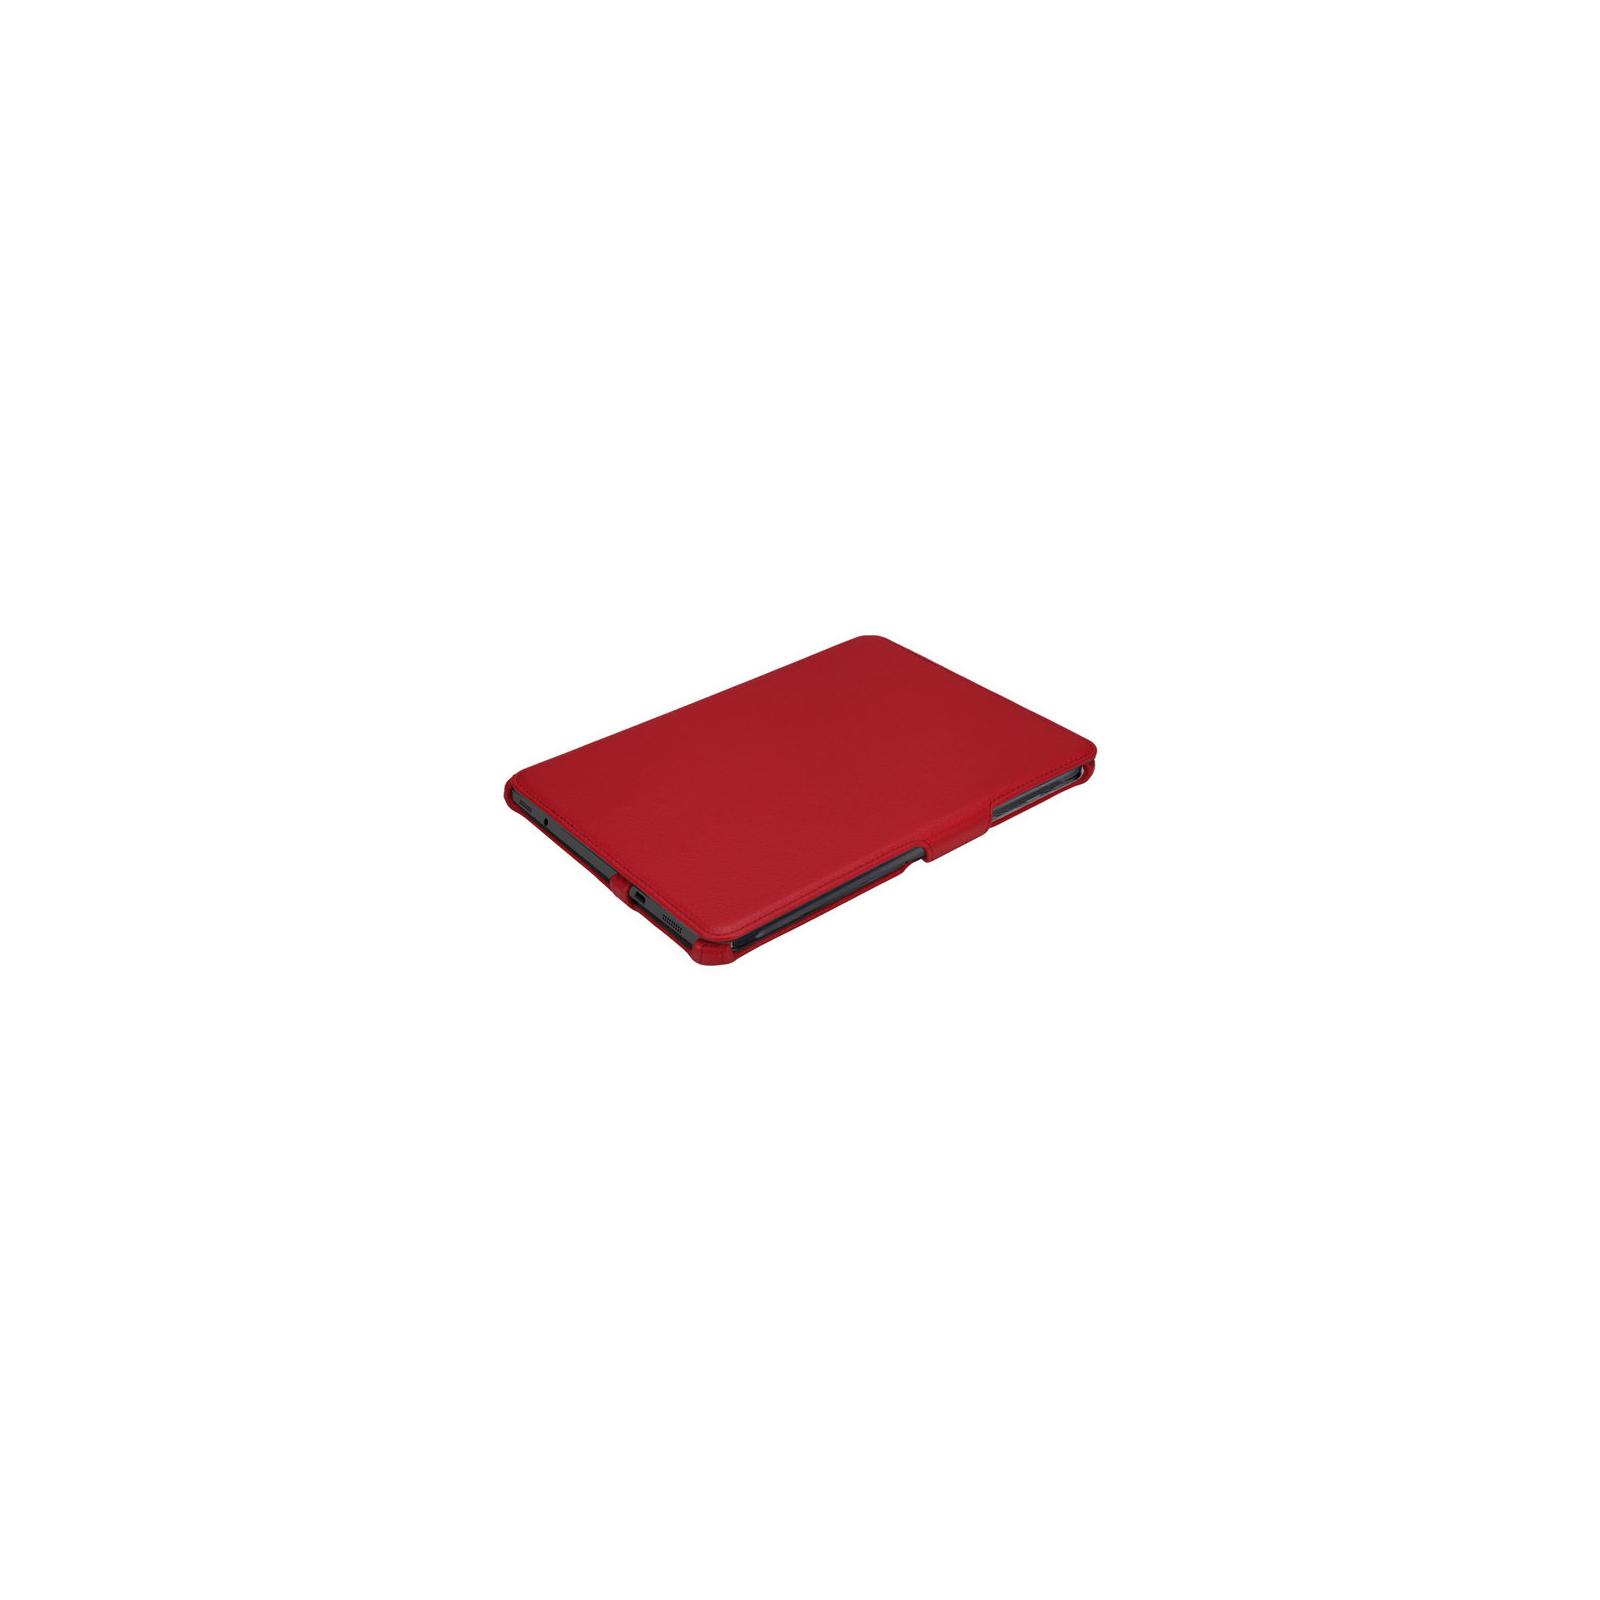 Чехол для планшета AirOn для Samsung Galaxy Tab S 2 9.7 red (4822352777456) изображение 3